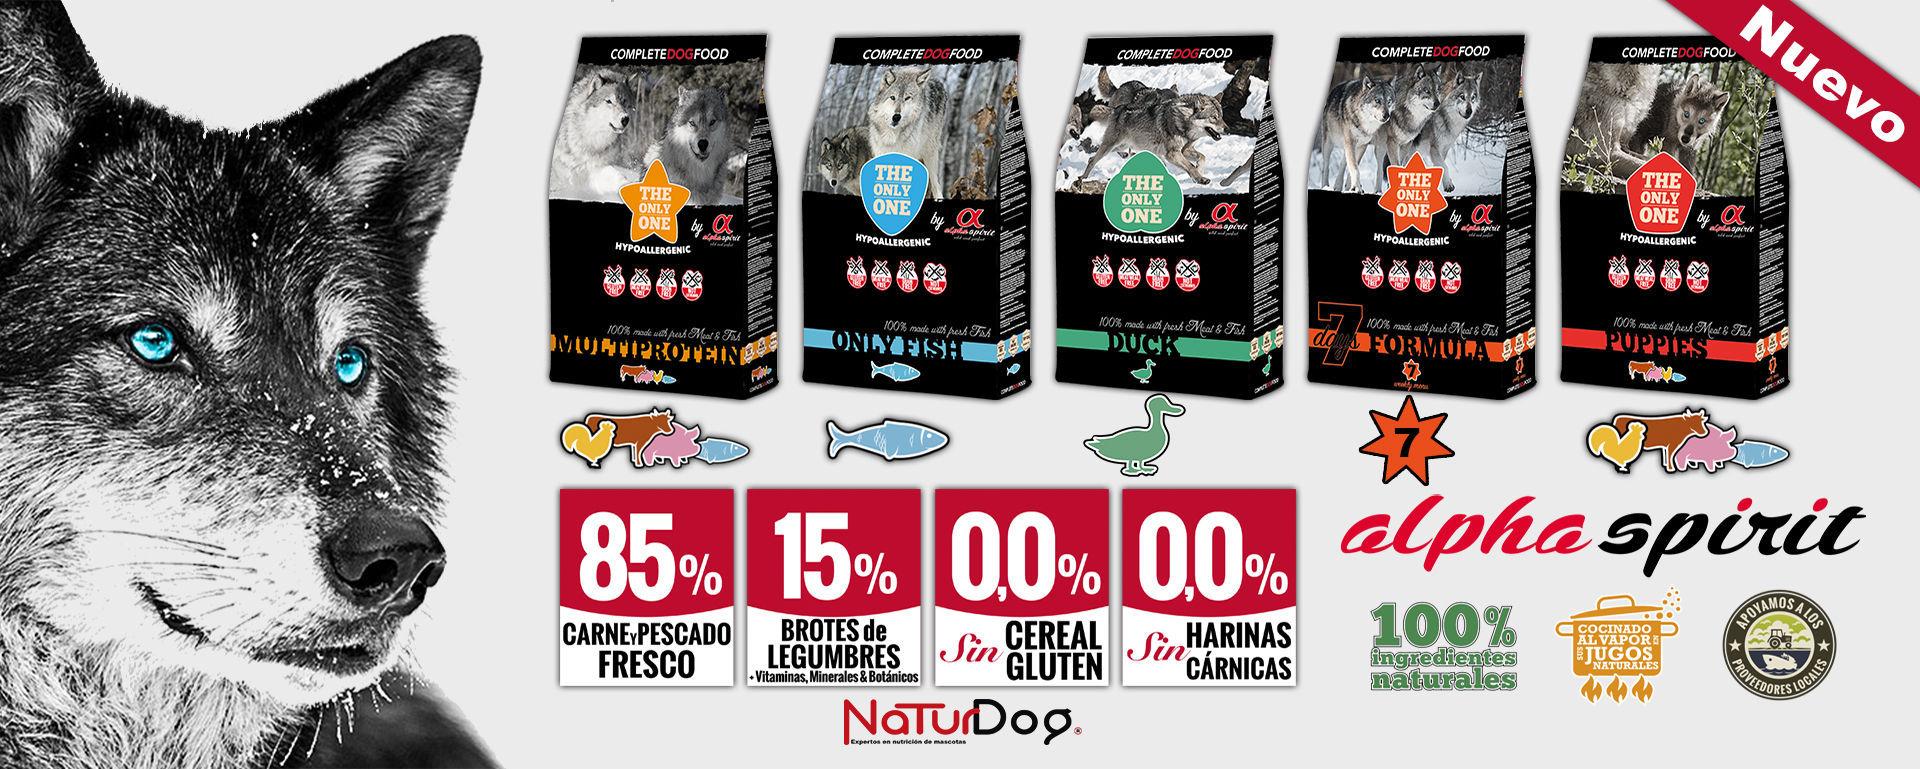 Alpha Spirit publicidad NaturDog